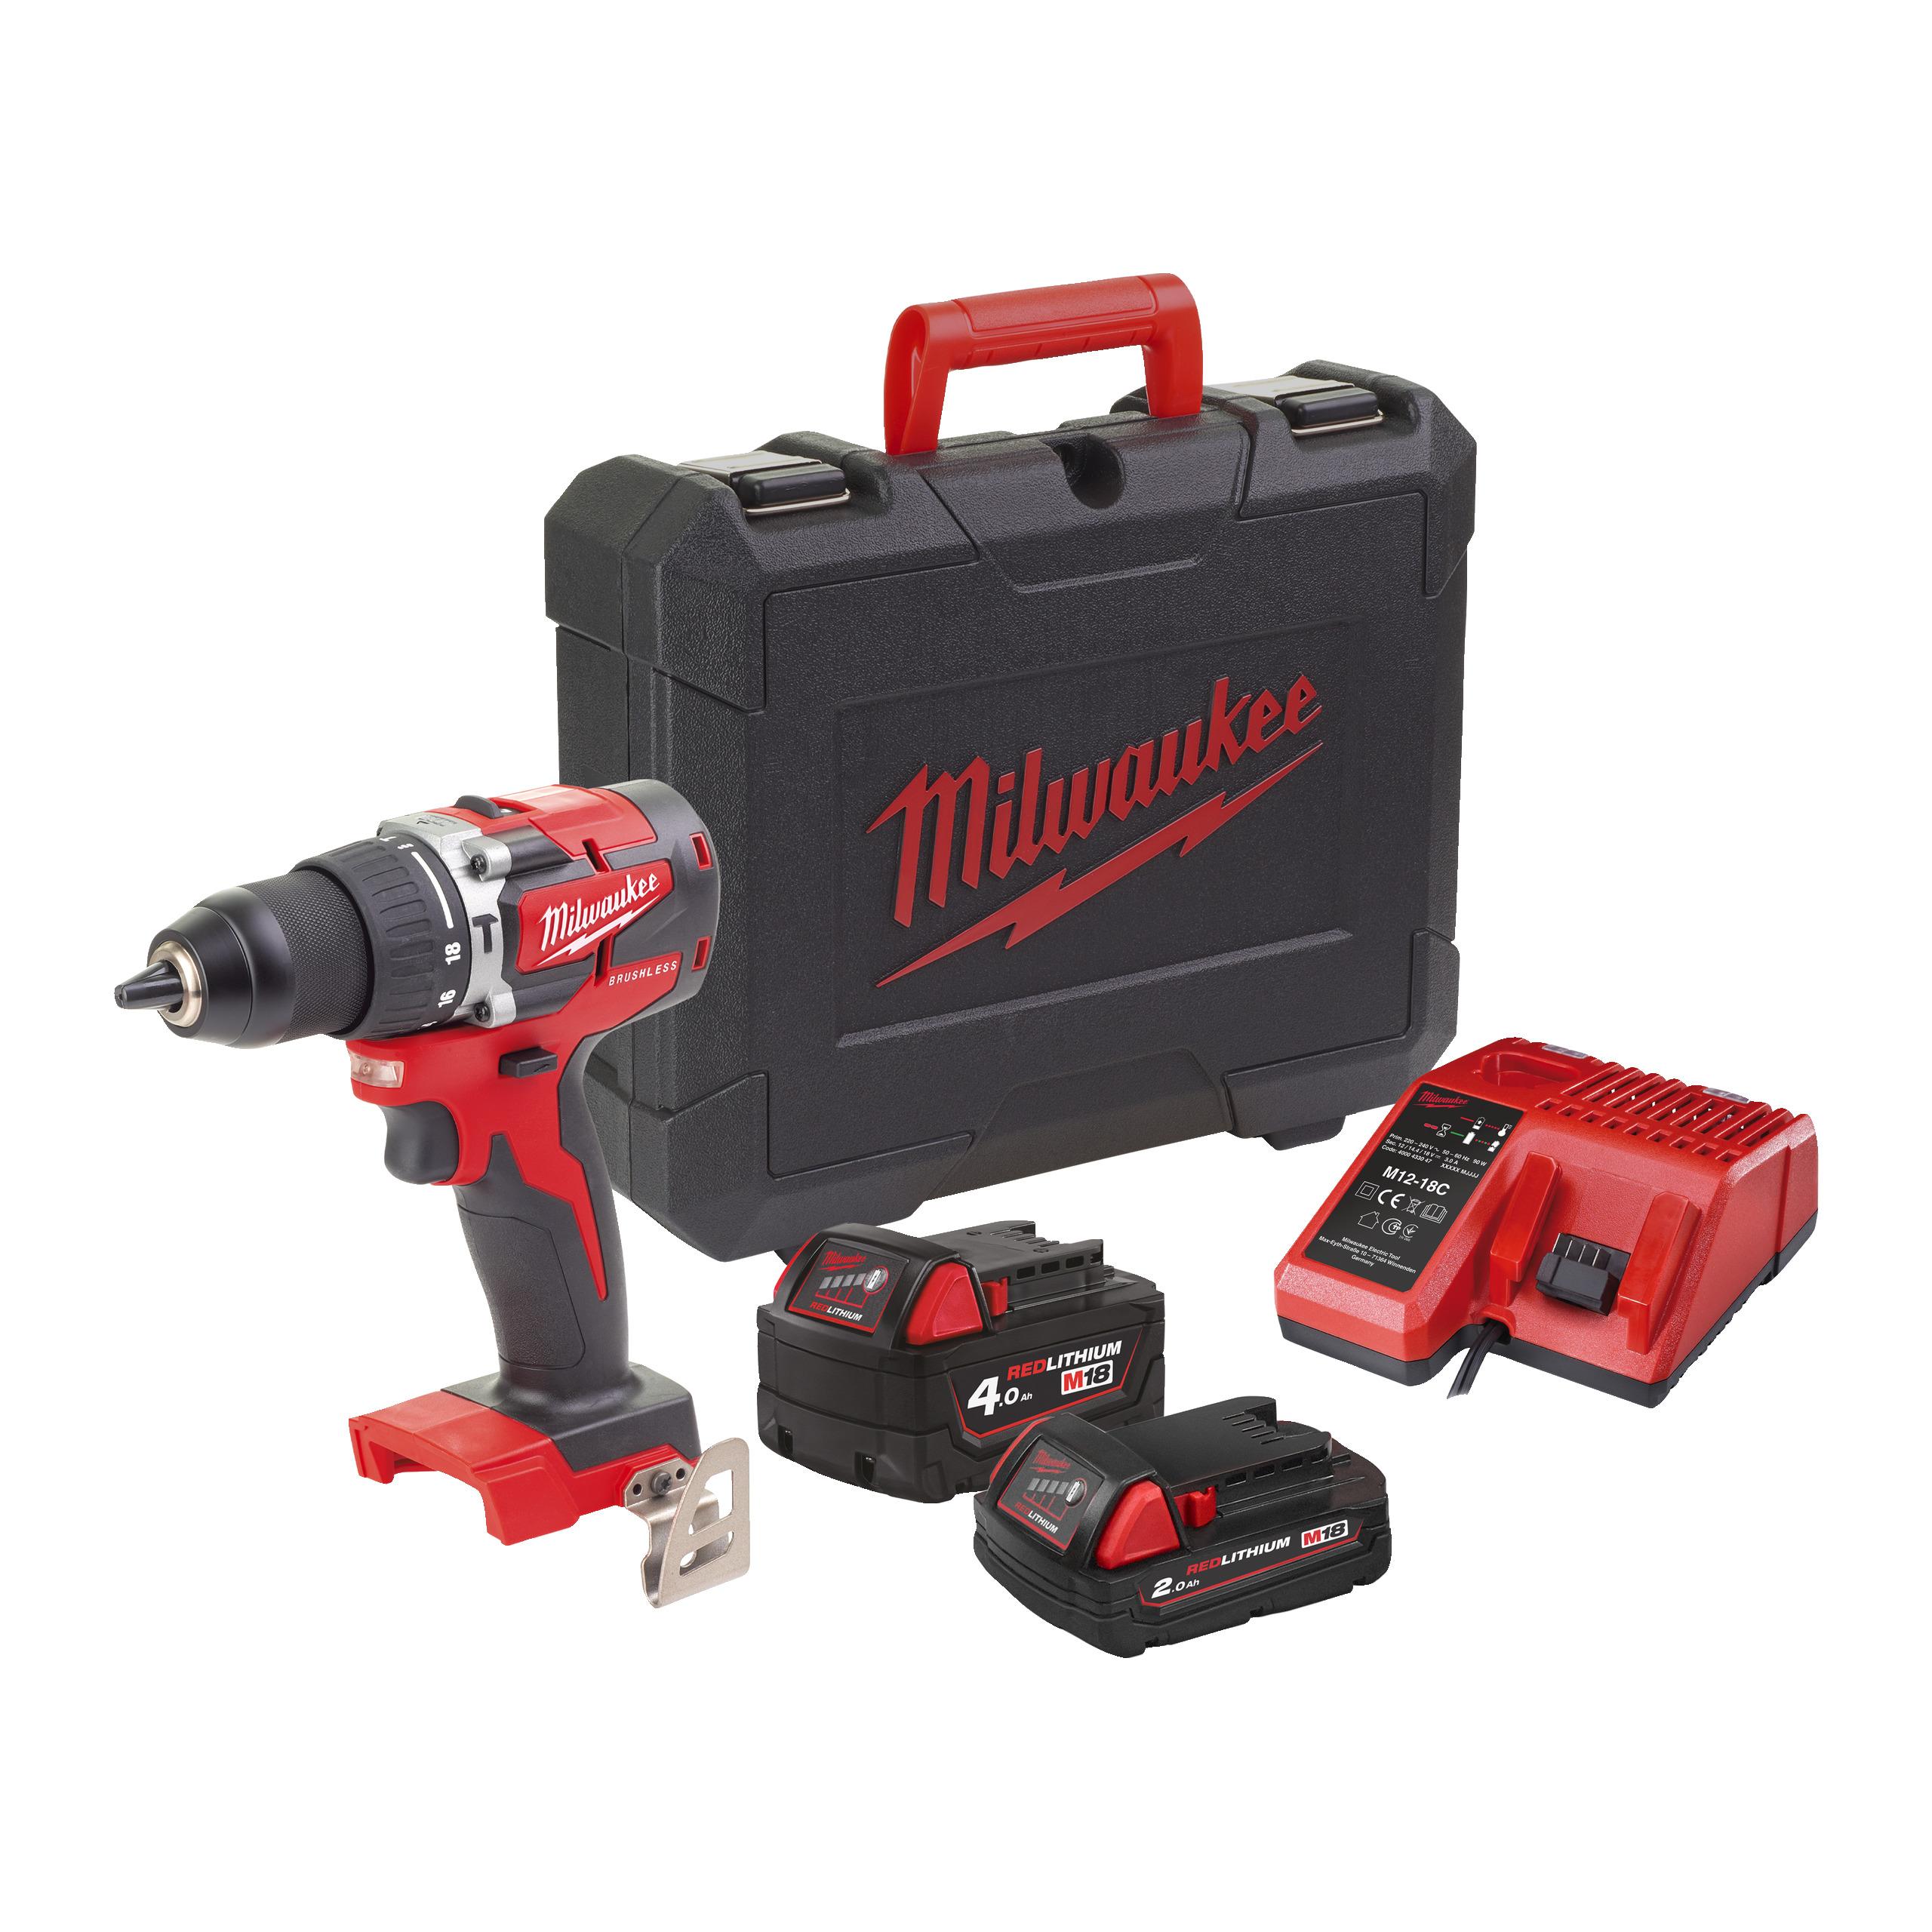 MILWAUKEE M18 CBLPD-422C